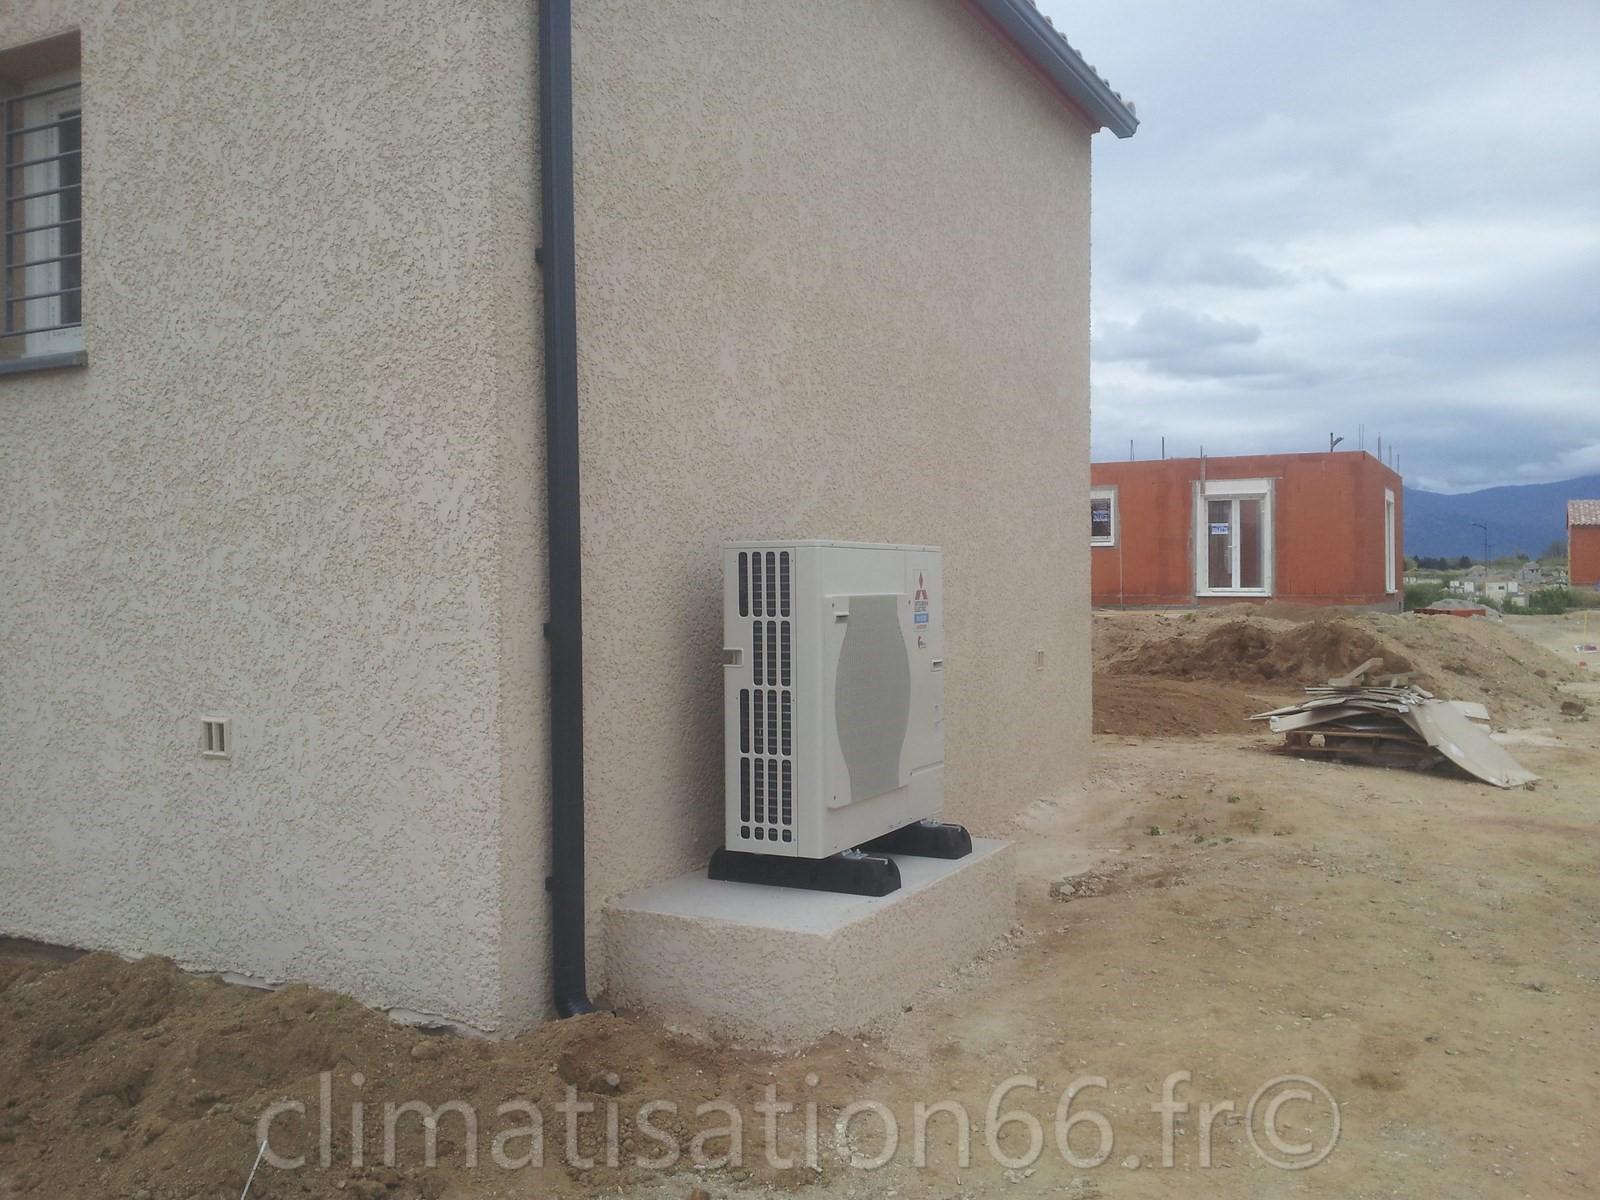 Climatisation maison bbc al nya for Climatisation centrale maison